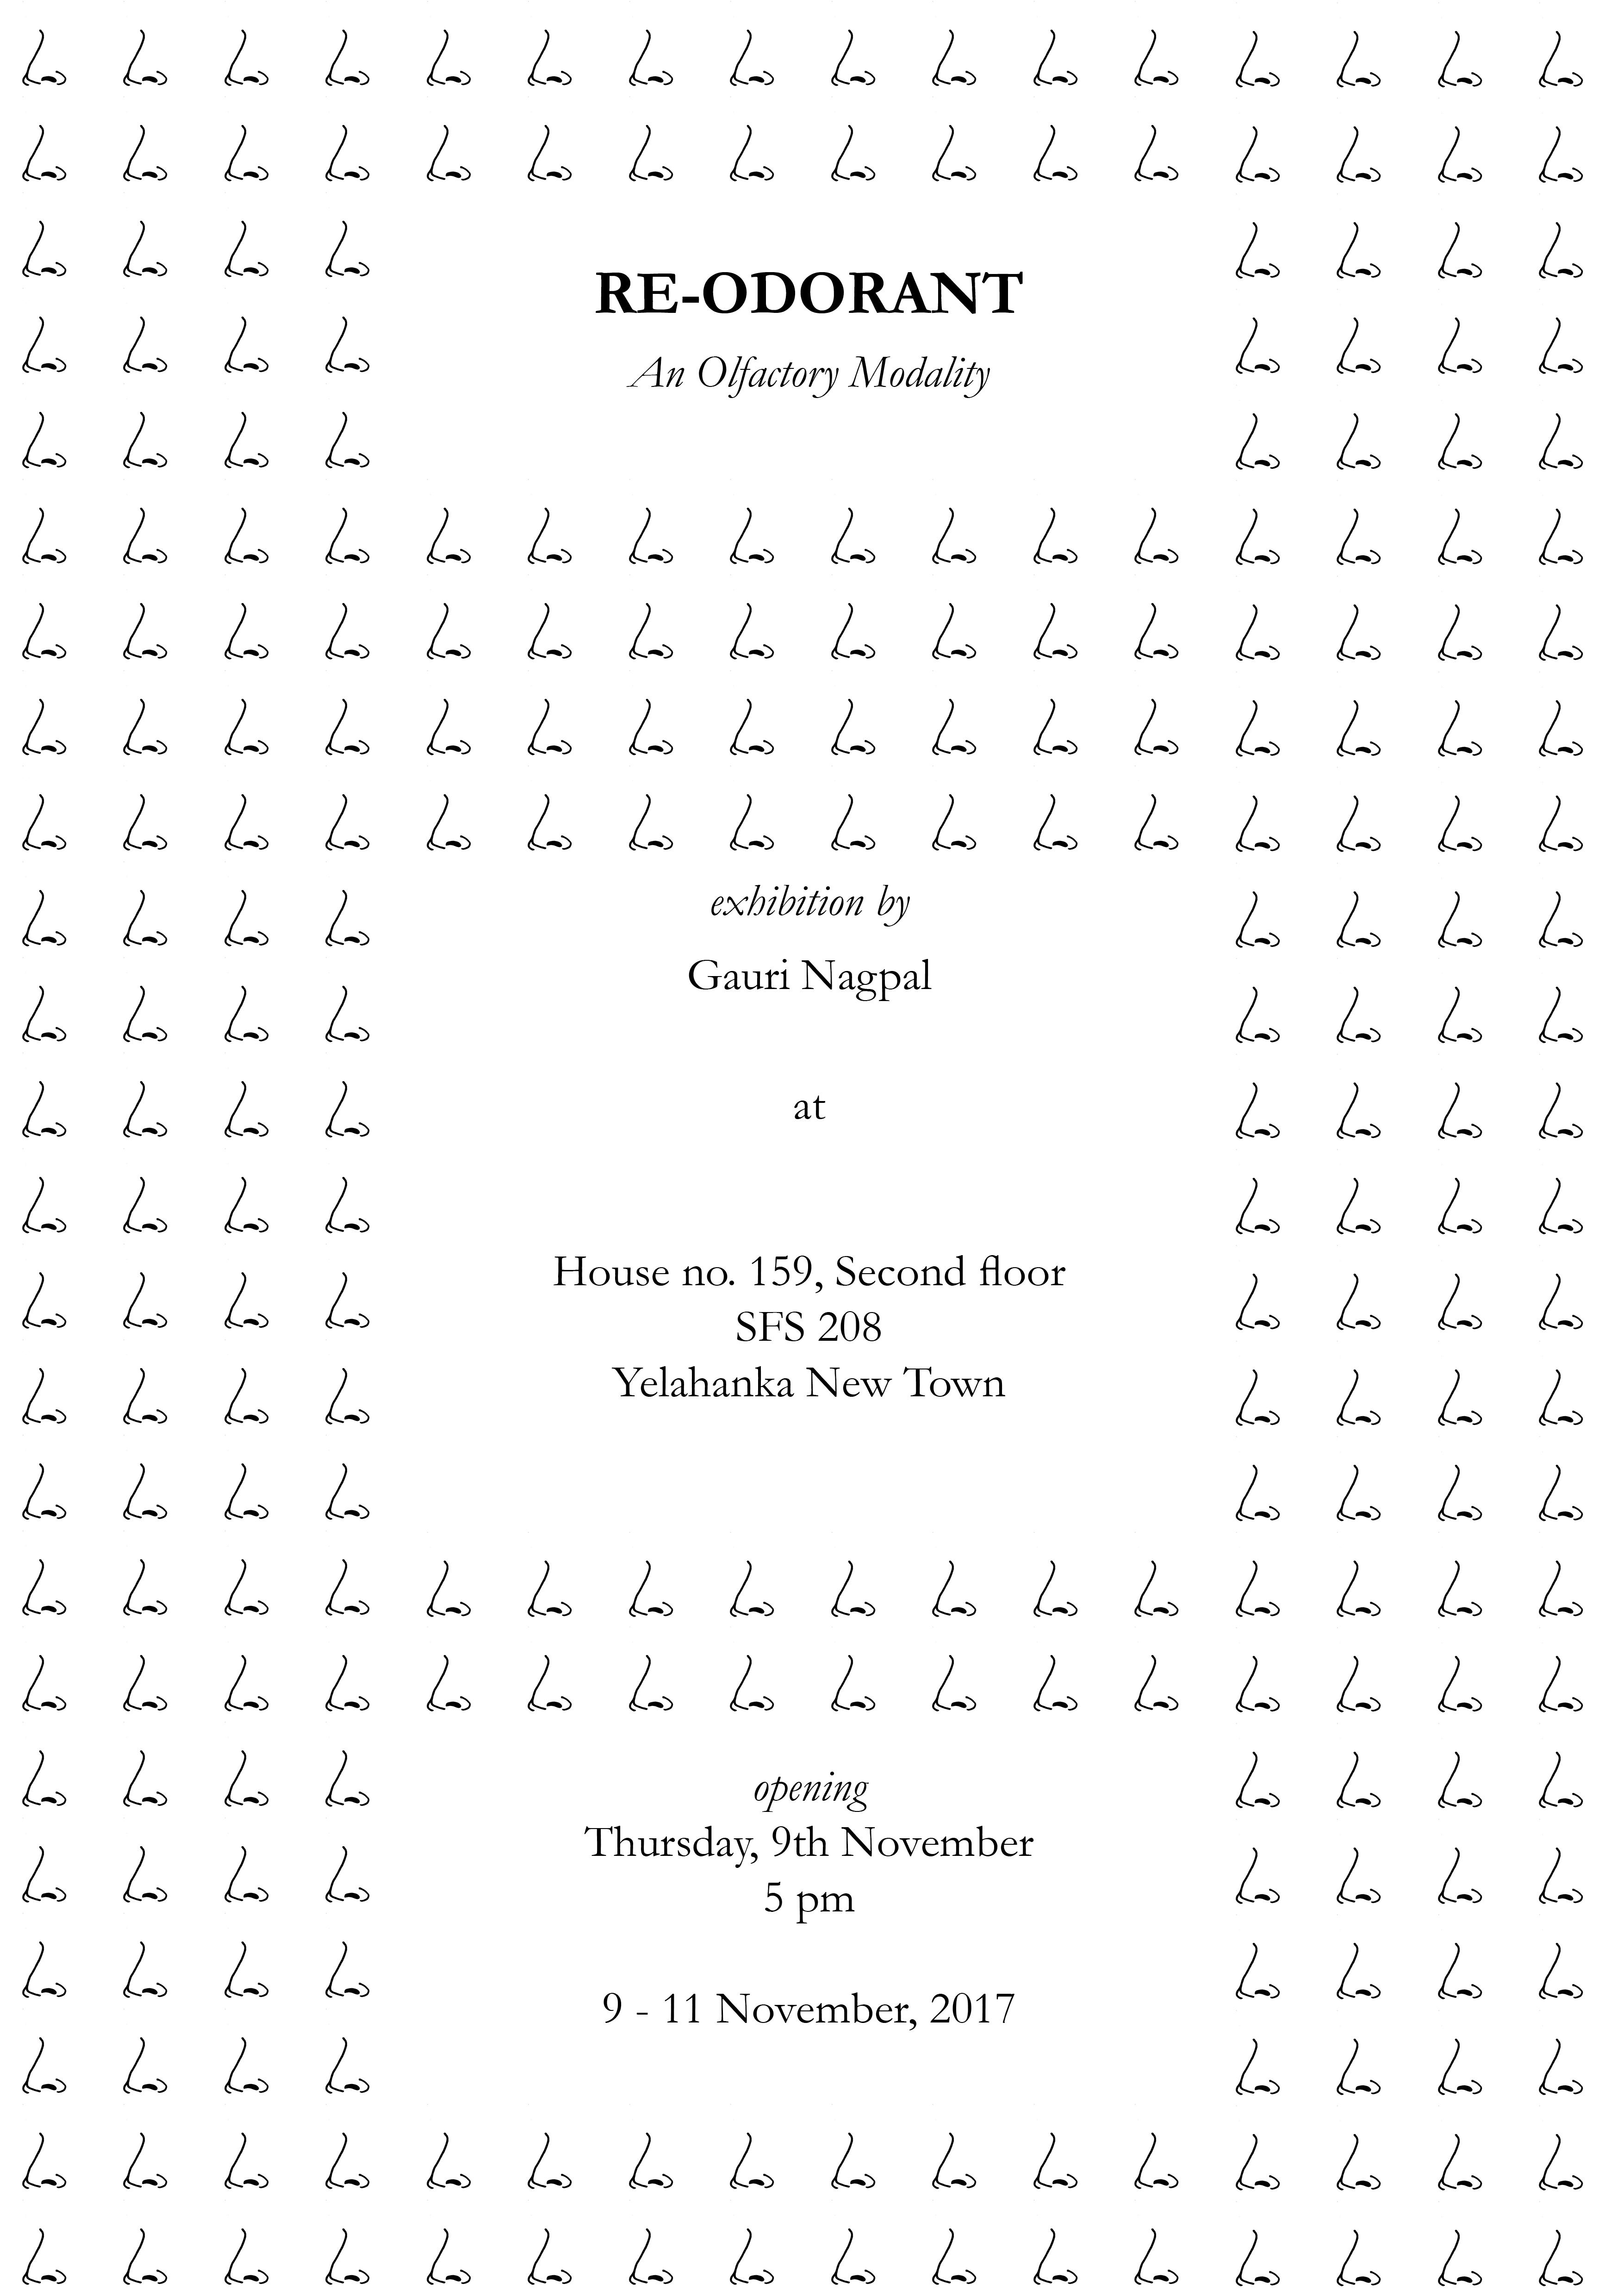 Poster - Re-odorant